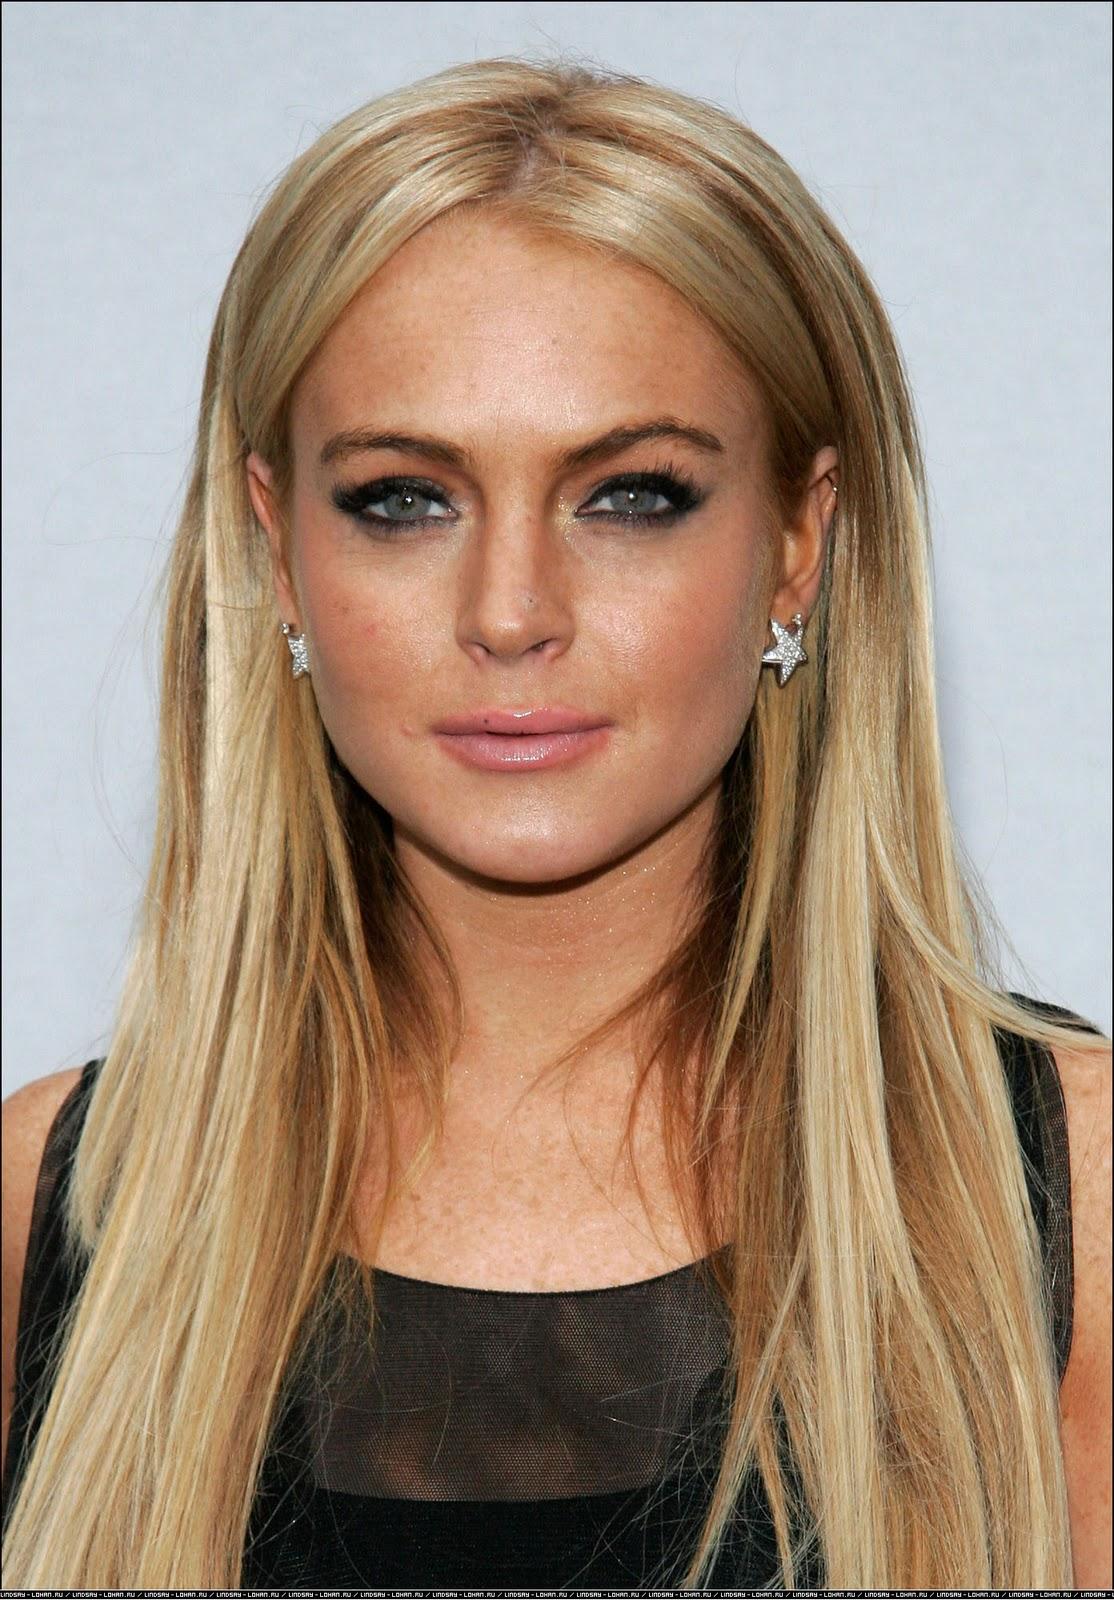 http://4.bp.blogspot.com/-2nCZT6kf0A4/ToT1ZhgWYYI/AAAAAAAAAoE/qjP9CxGnlm8/s1600/Lindsay-Lohan-pics-songs-hairstyle-movies-images-photos+5.jpg